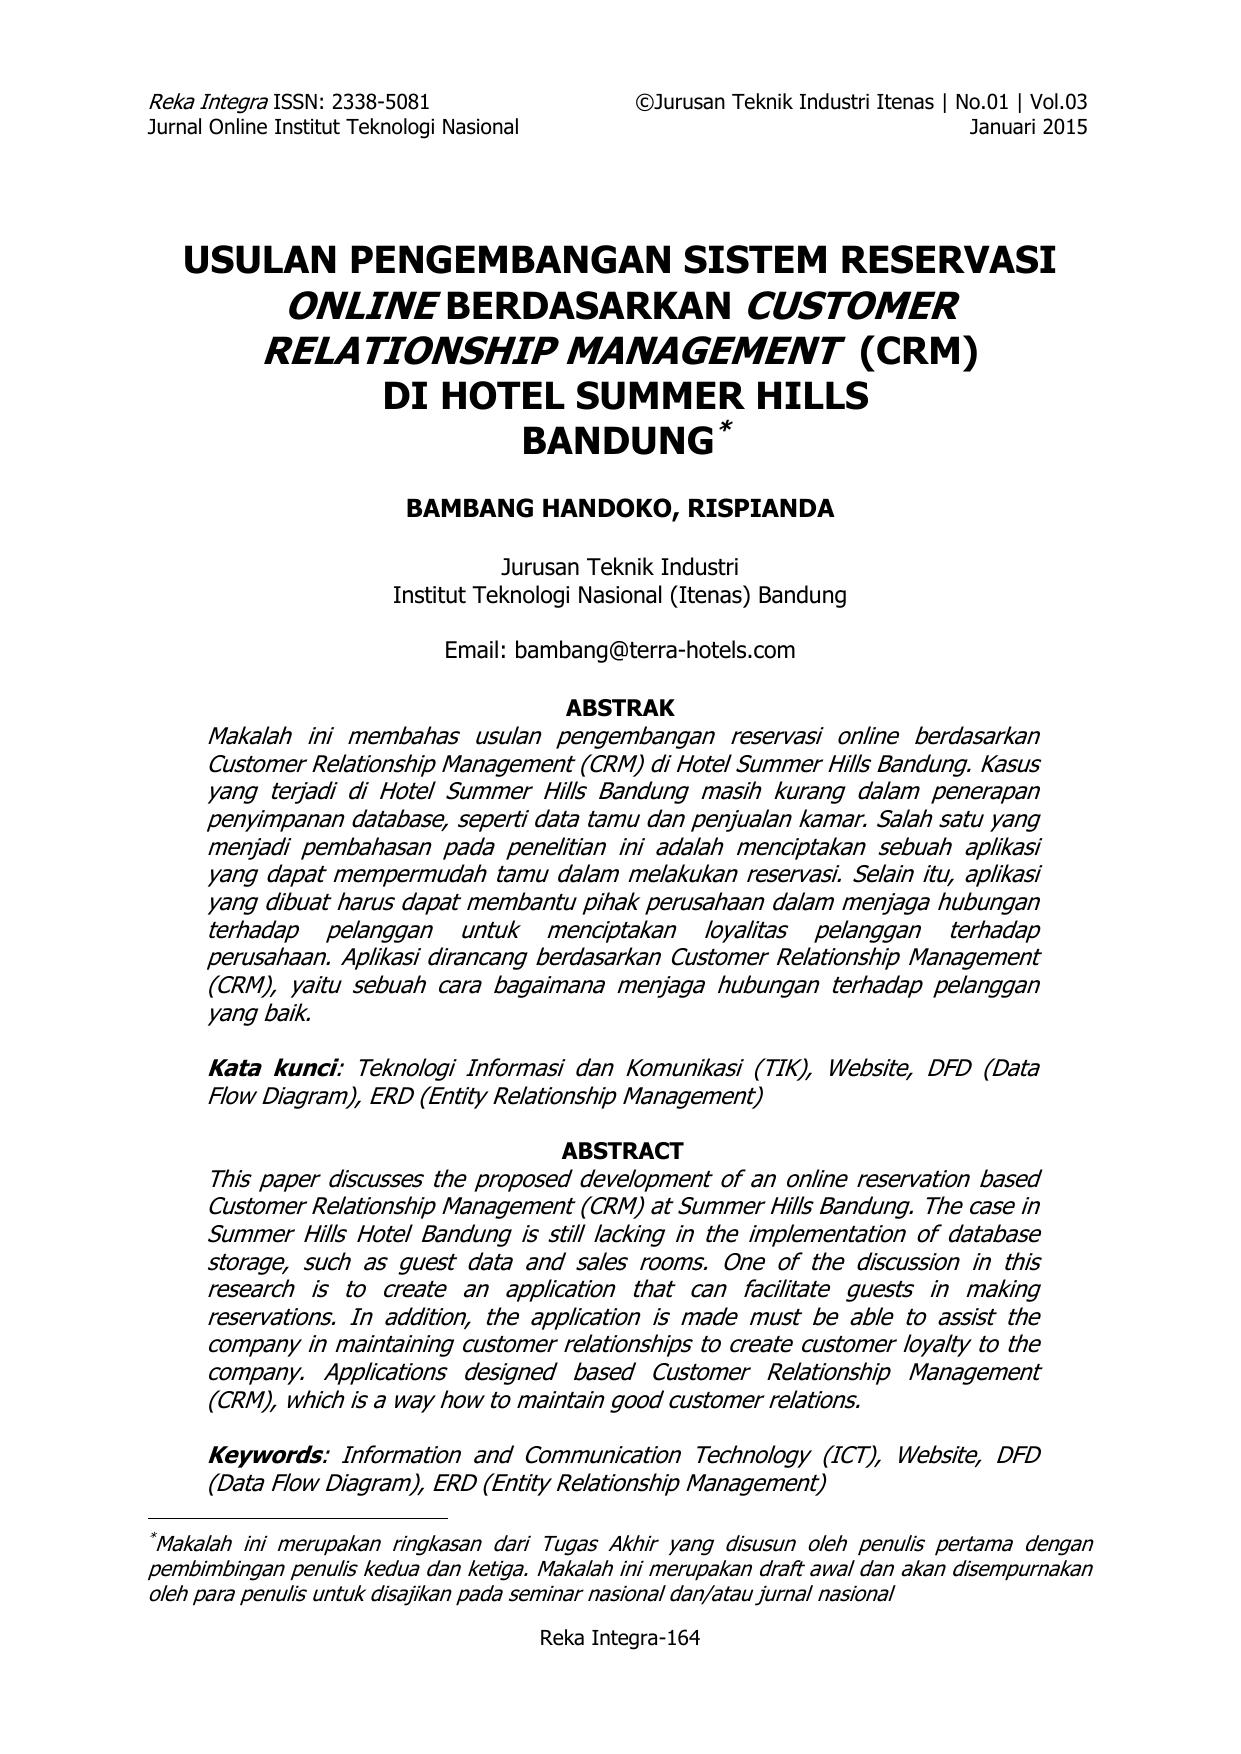 Relationship Management Crm